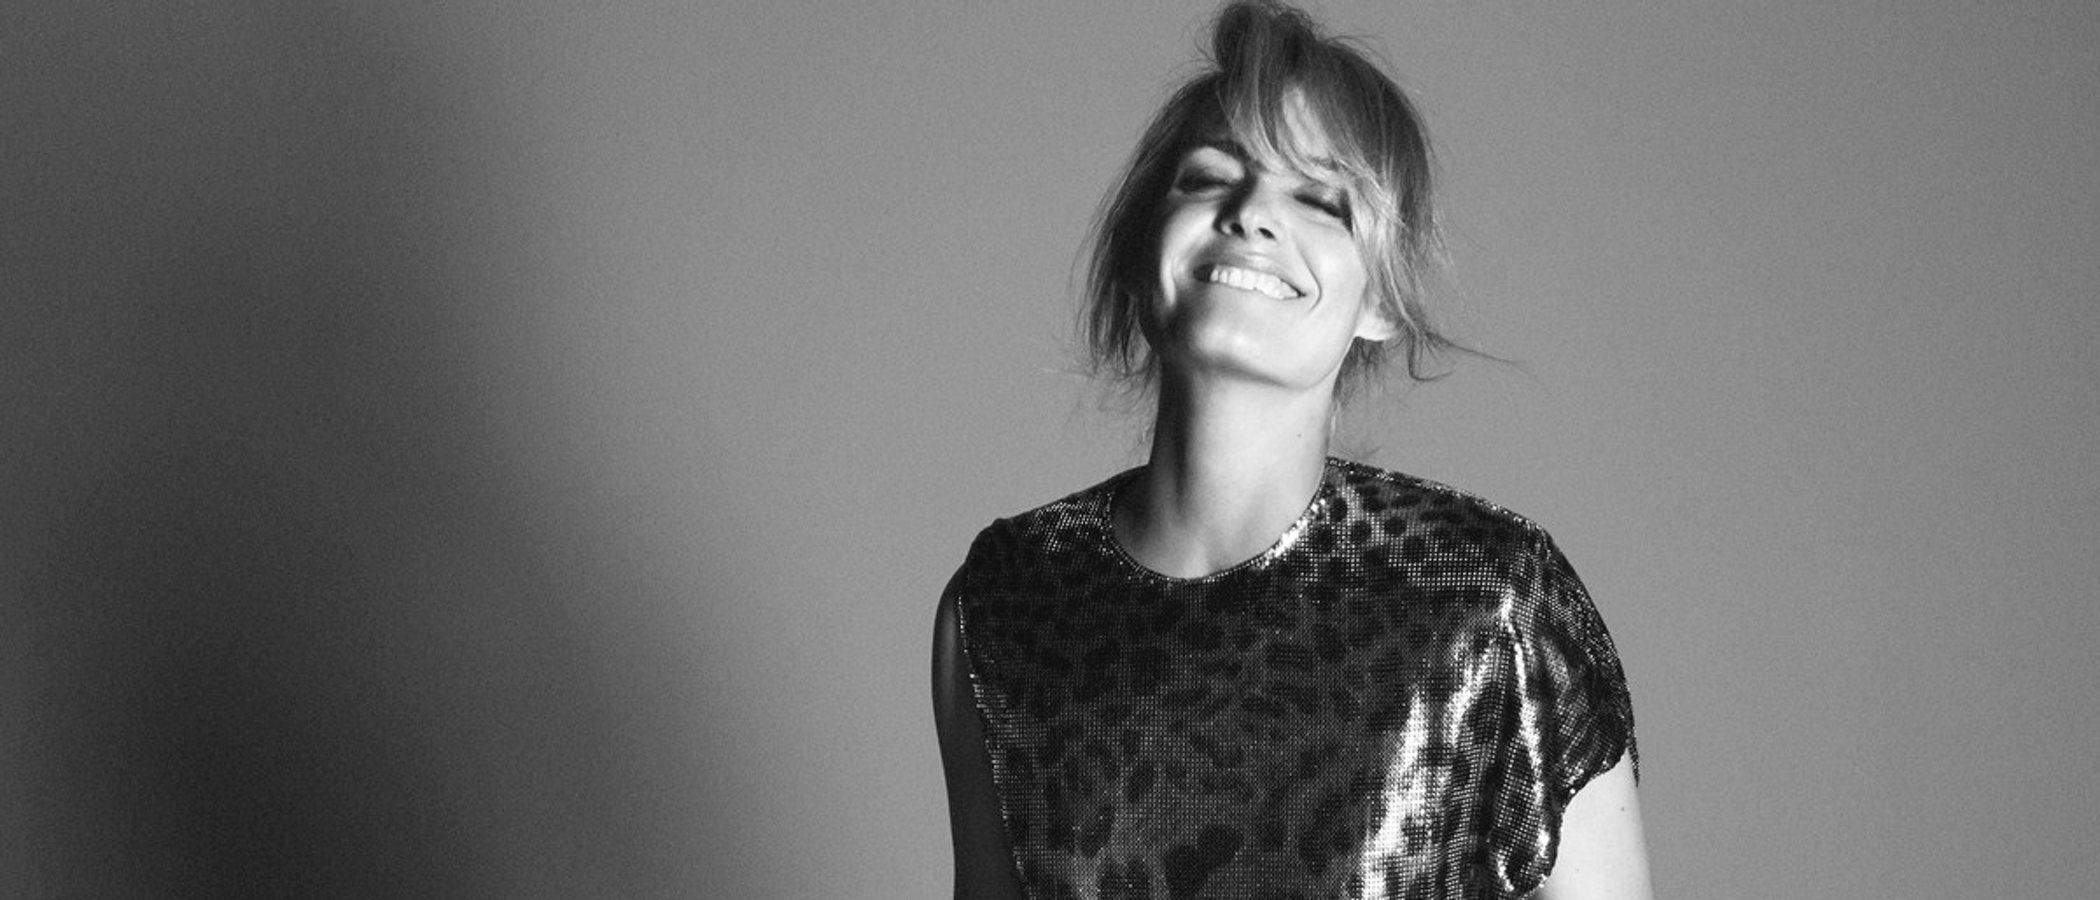 Amber Valletta protagoniza la campaña de primavera 2019 de Yves Saint Laurent